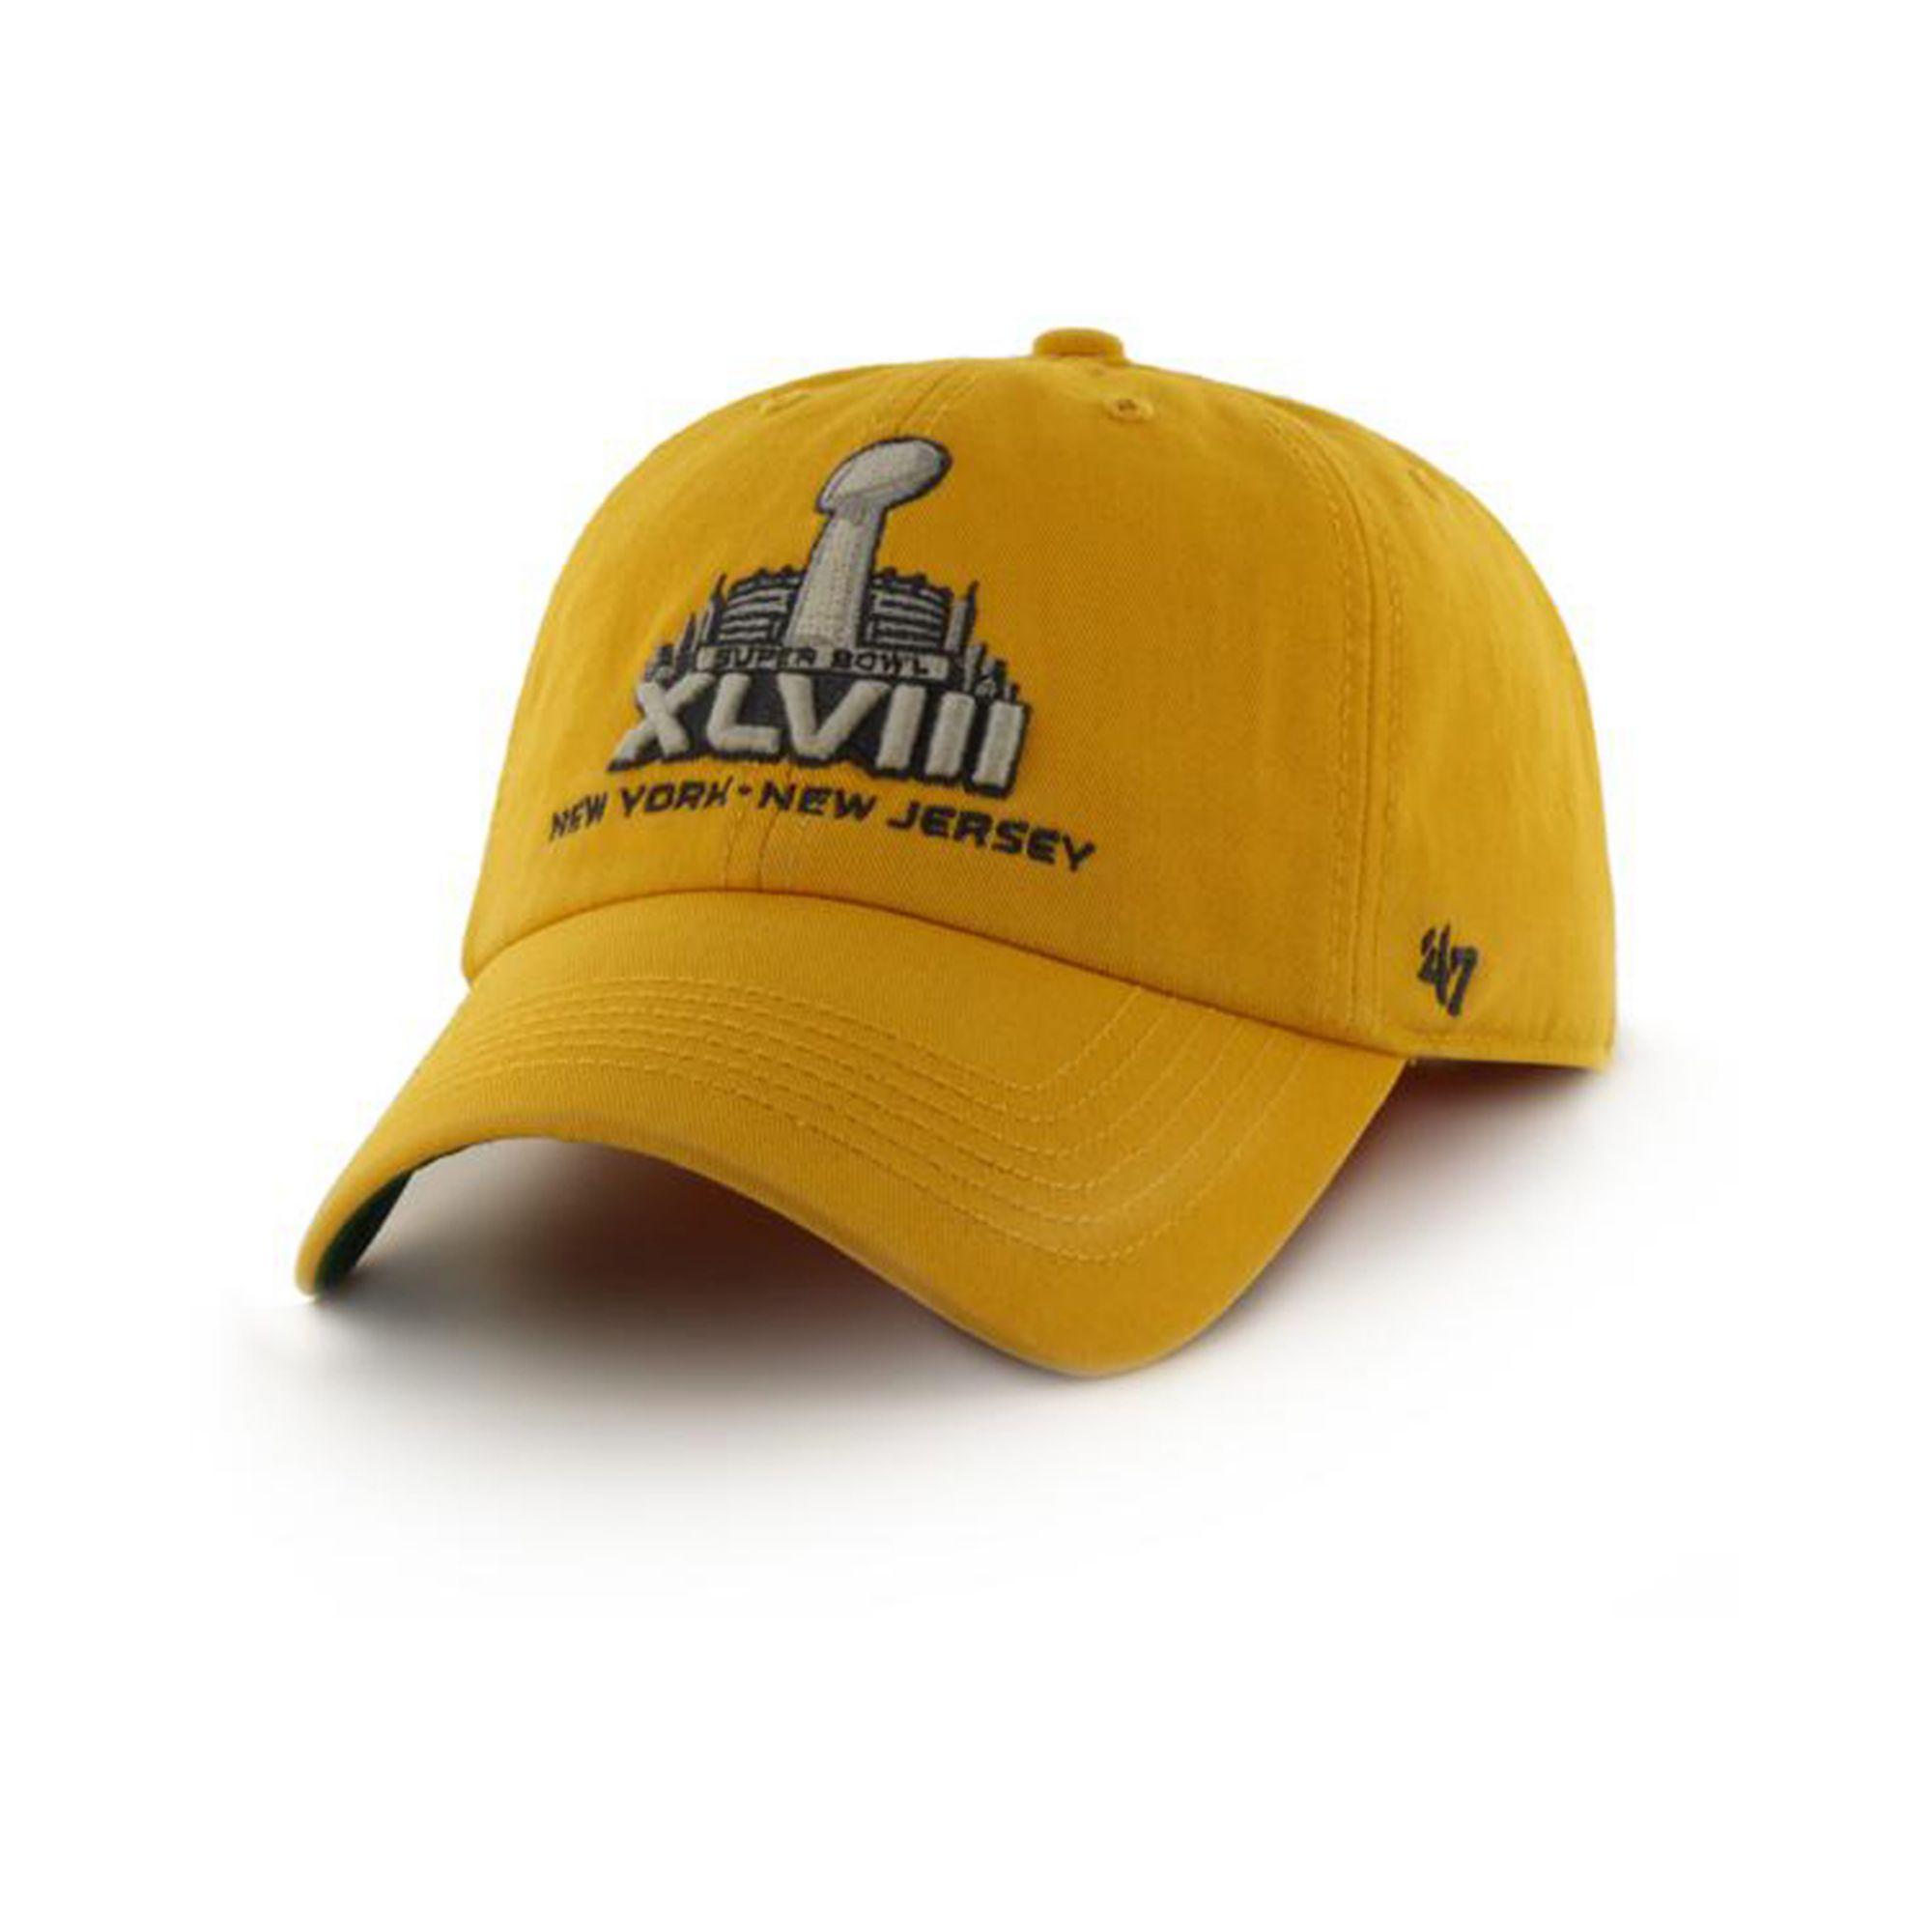 7c1c56978c6de Lyst - 47 Brand Super Bowl Xlviii 47 Franchise Cap in Yellow for Men